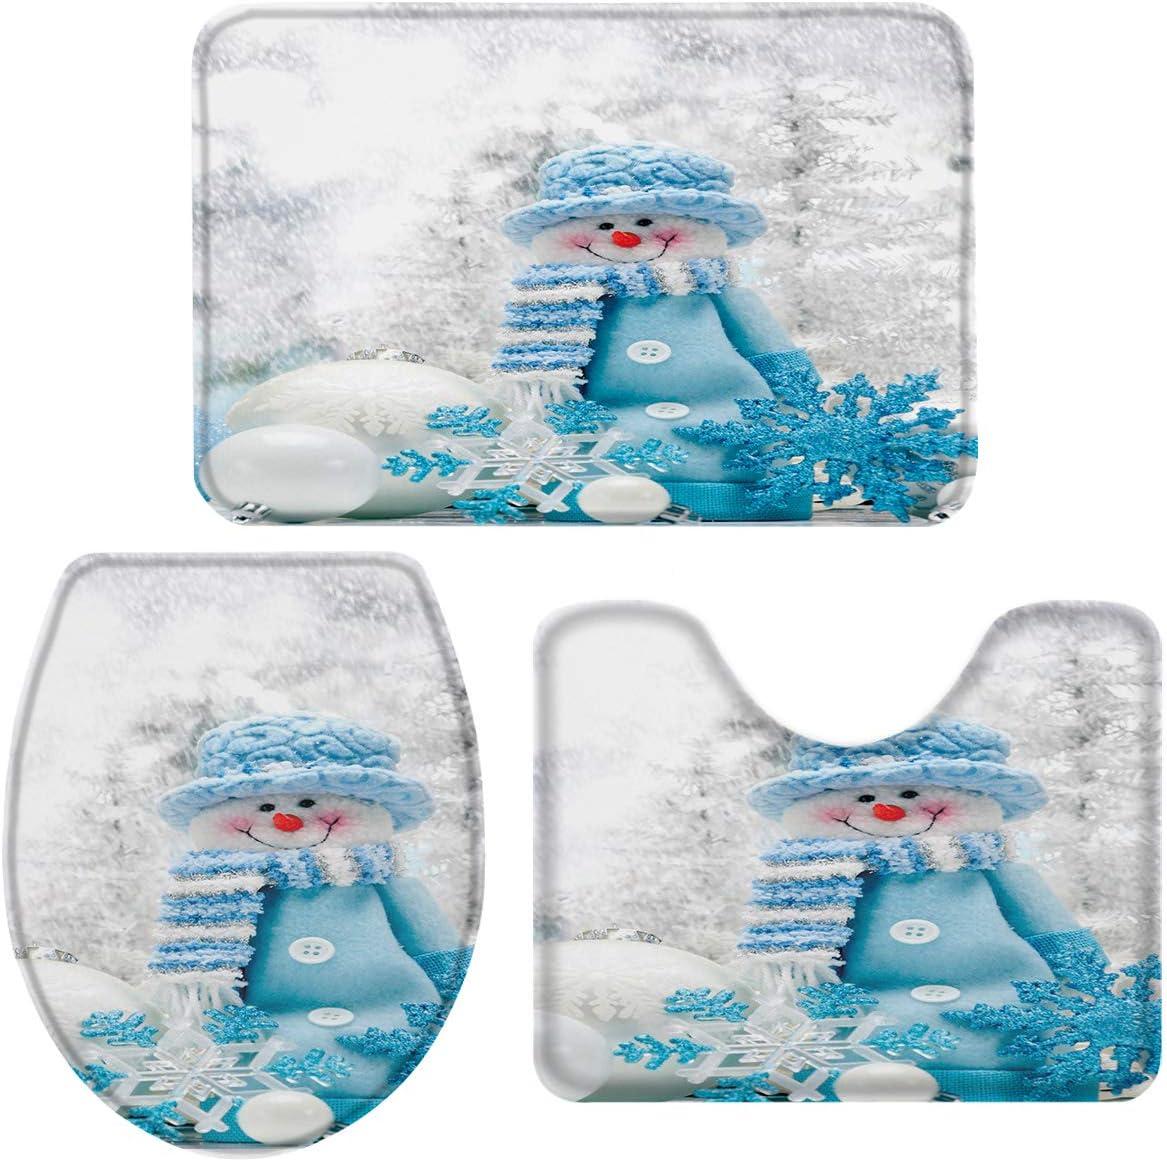 Toilet Seat Cover Cute Snowman Snowflake Non-Slip Bathroom Doormat Runner Rugs U-Shaped Toilet Floor Mat Large OneHoney 3-Piece Bath Rug and Mat Sets